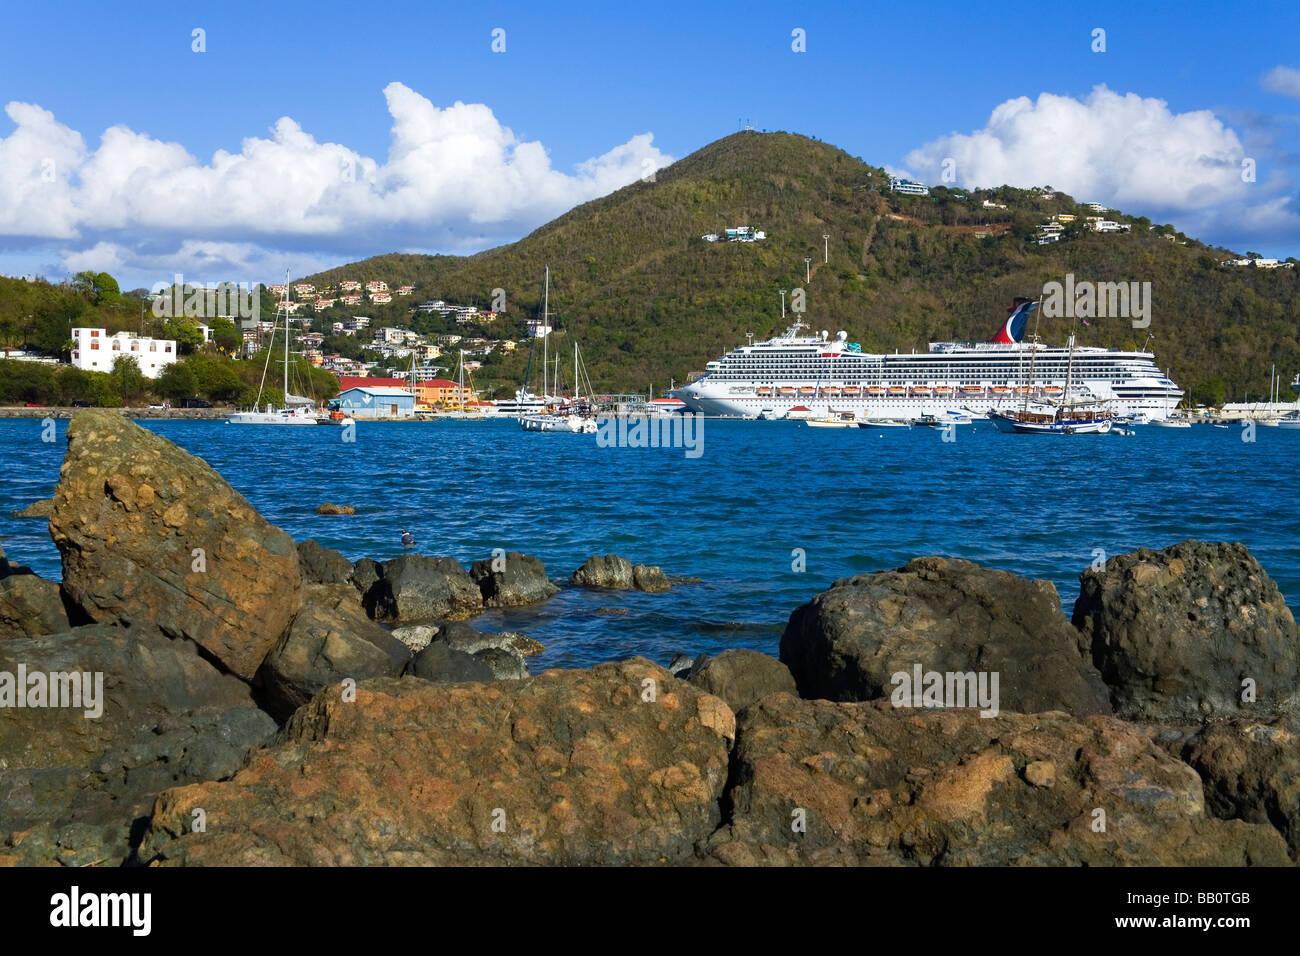 Rocks and cruise ship; Charlotte Amalie, St. Thomas Island, U.S. Virgin  Islands